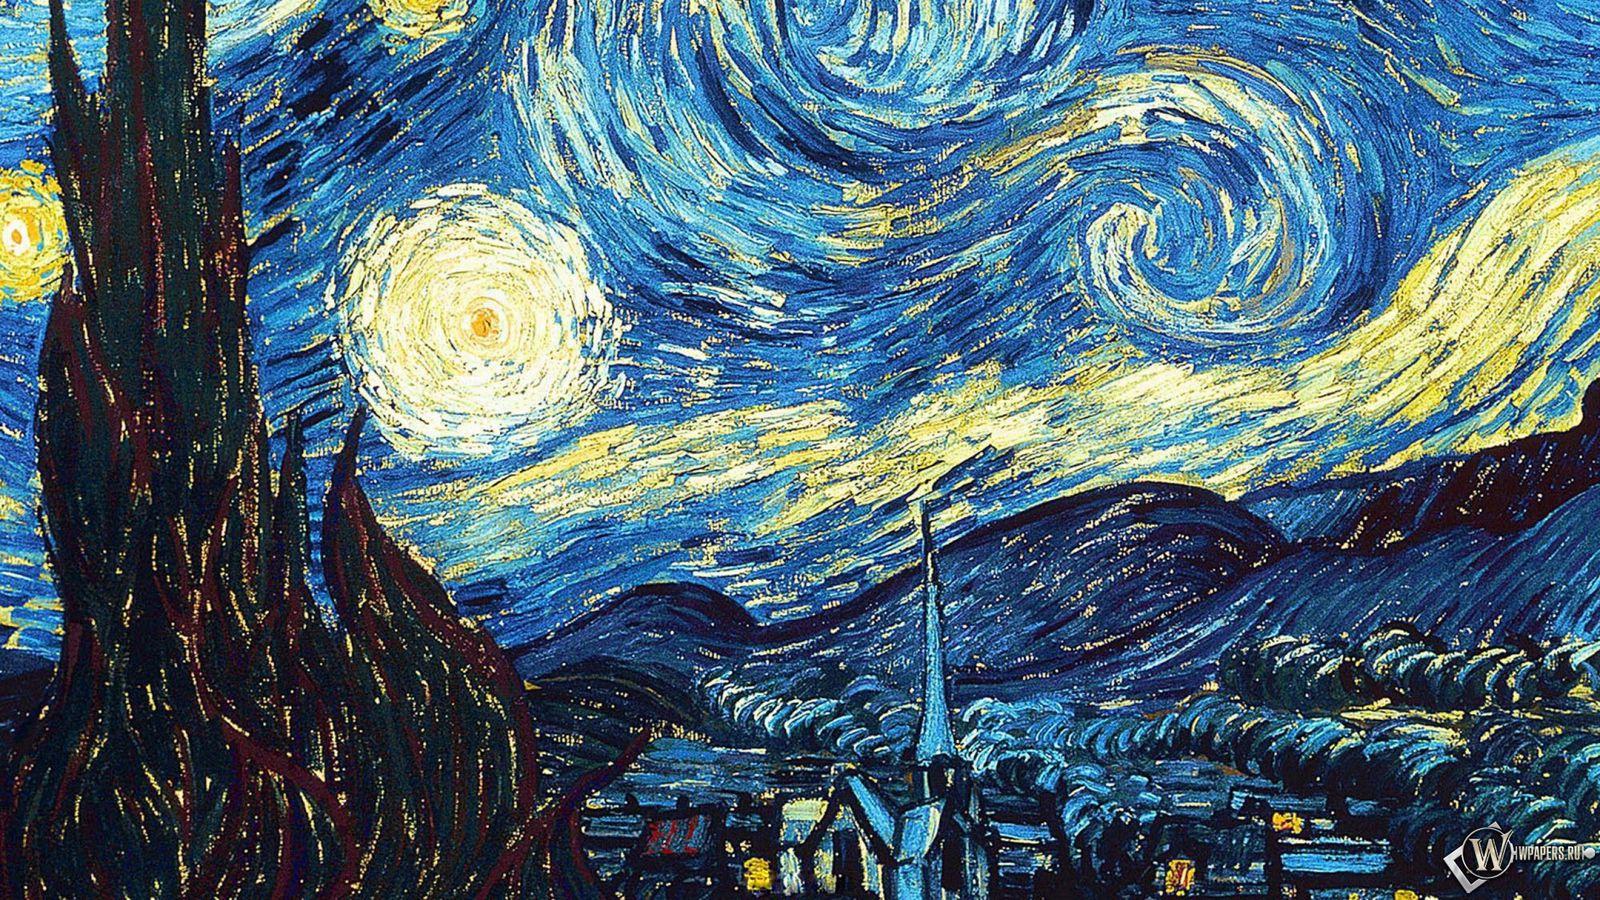 1600x900 Wallpaper vincent van gogh, the starry night, oil, canvas